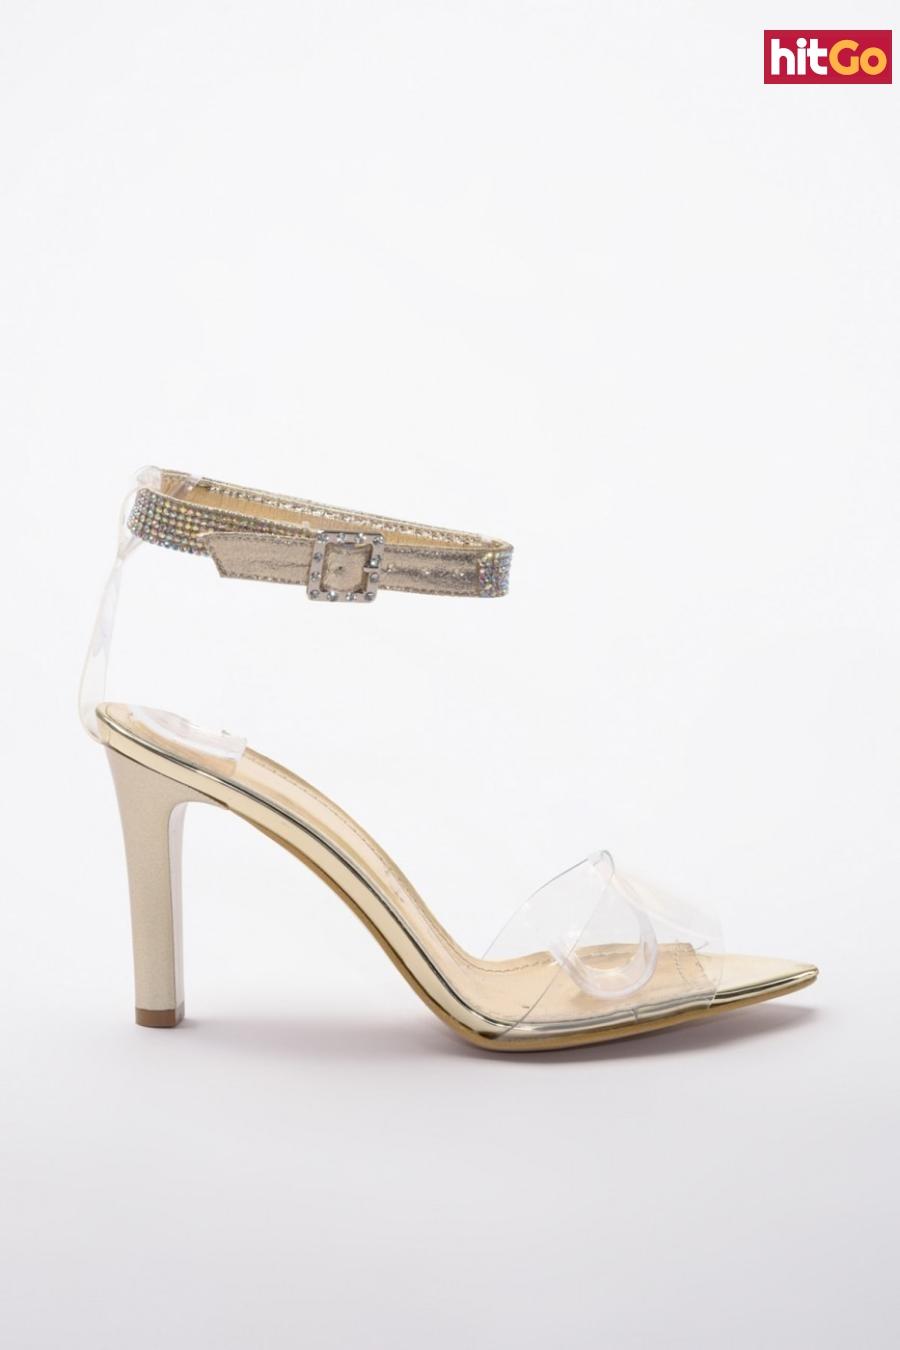 Trendyol Golden Stone Detailed Transparent Womens Classic Heels dámské 39